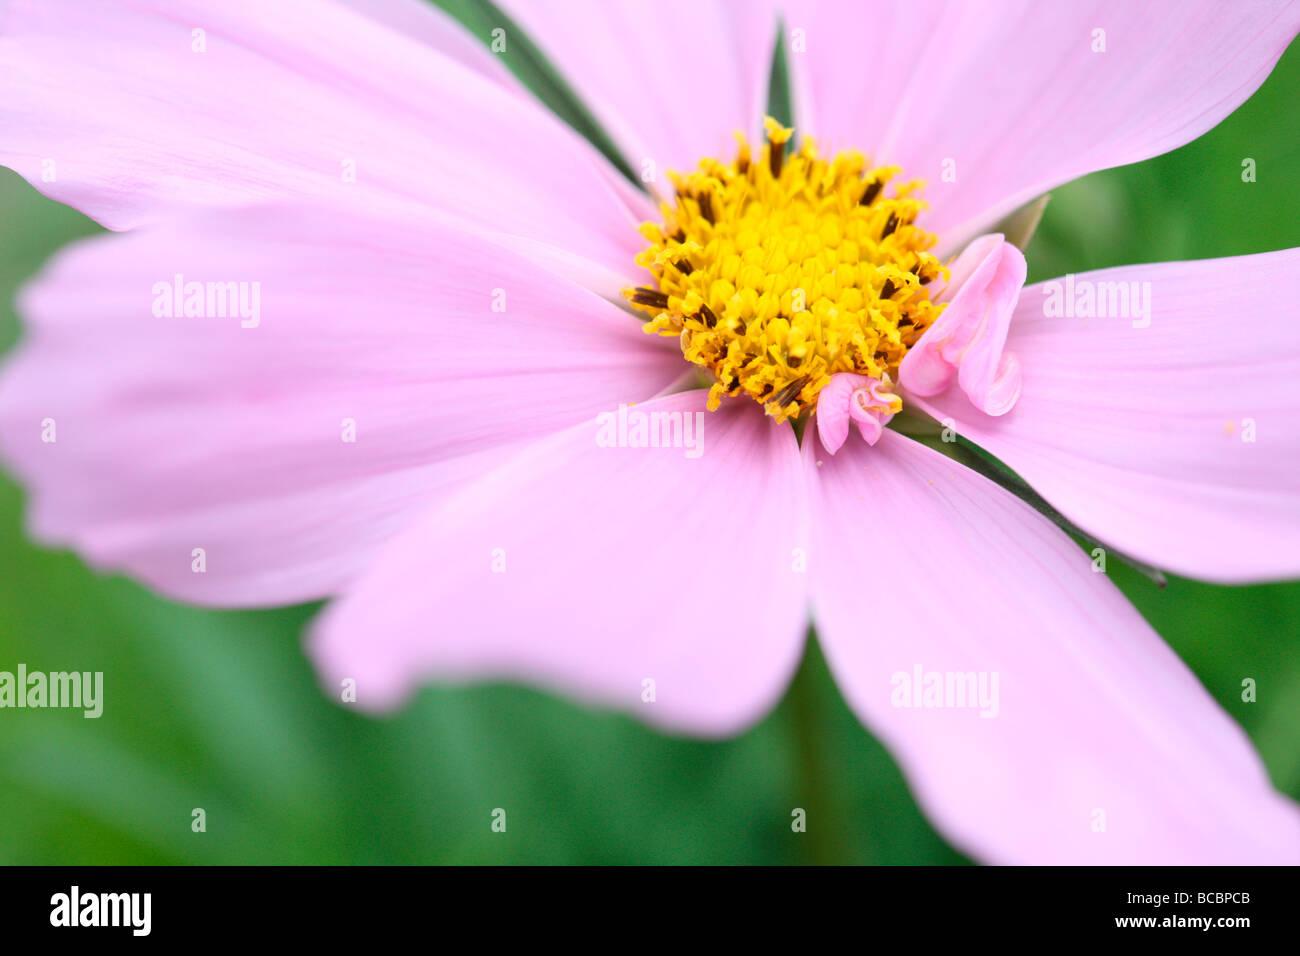 beautiful pink flower gorgeous fern like foliage cosmos sonata fine art photography Jane Ann Butler Photography - Stock Image